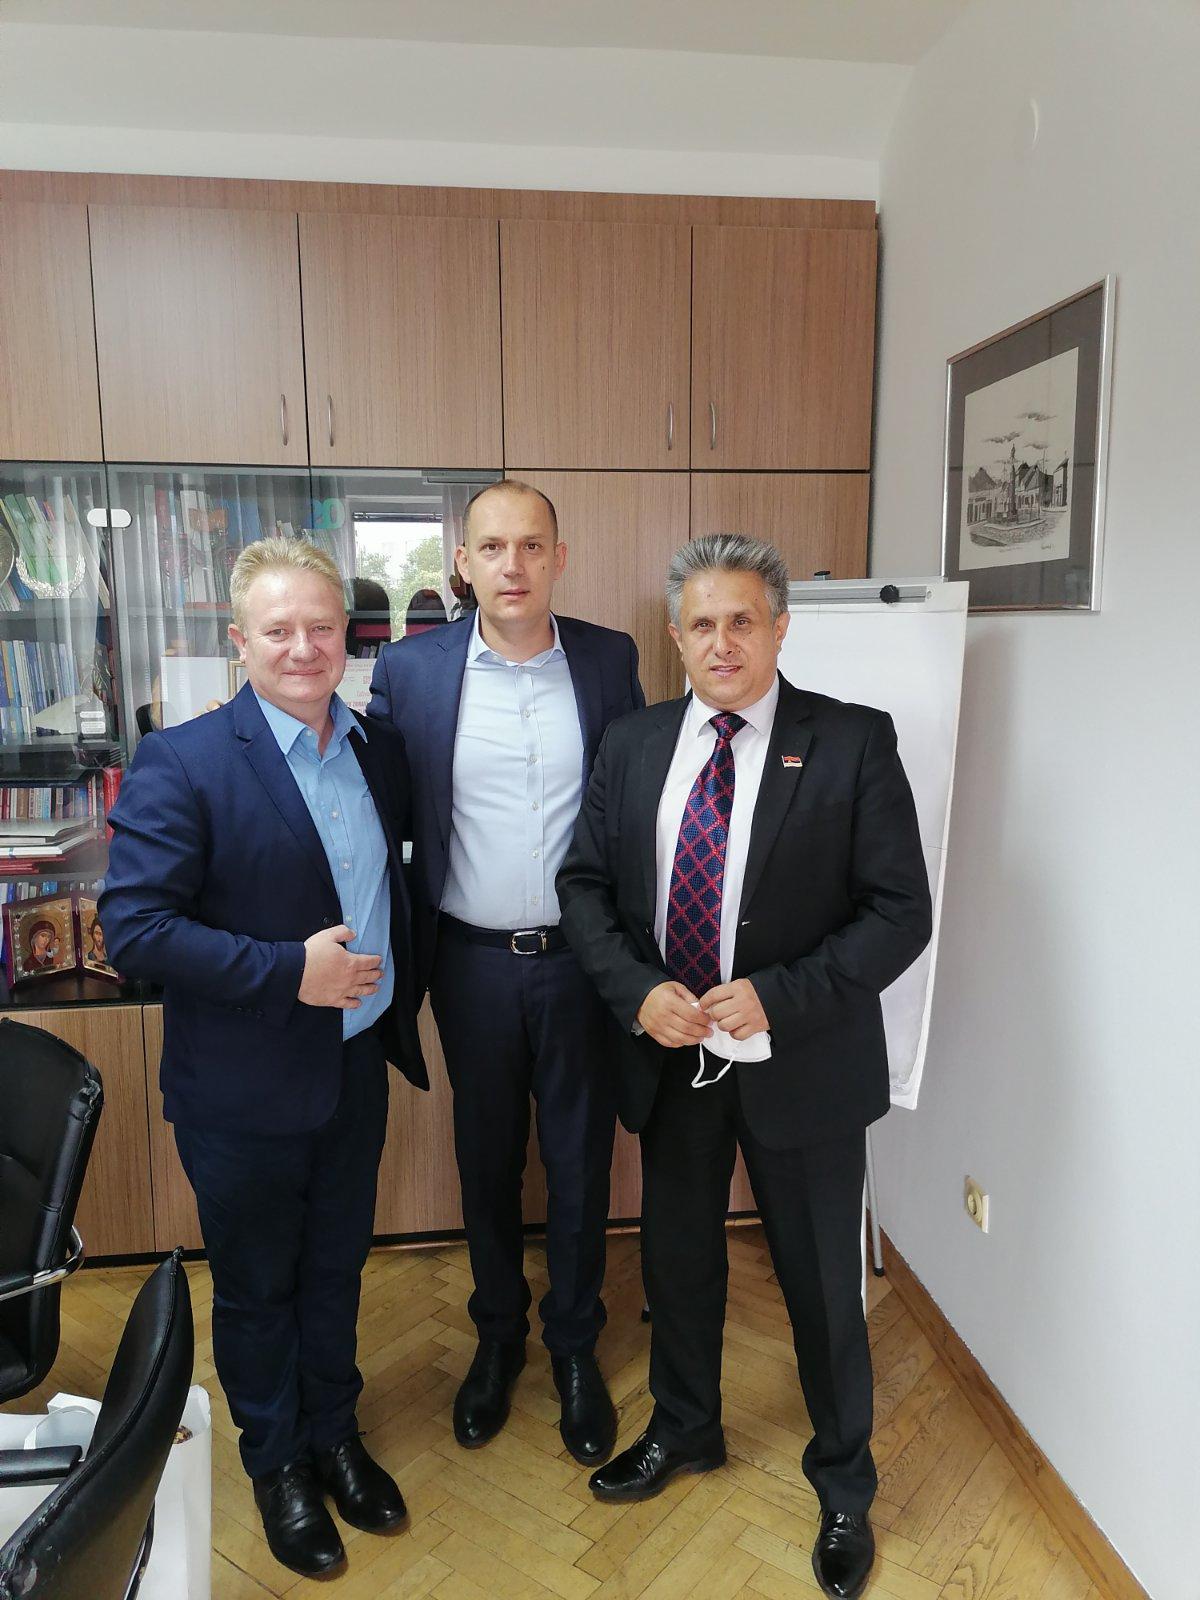 Antić, Lončar i Miletić, foto: M.M.